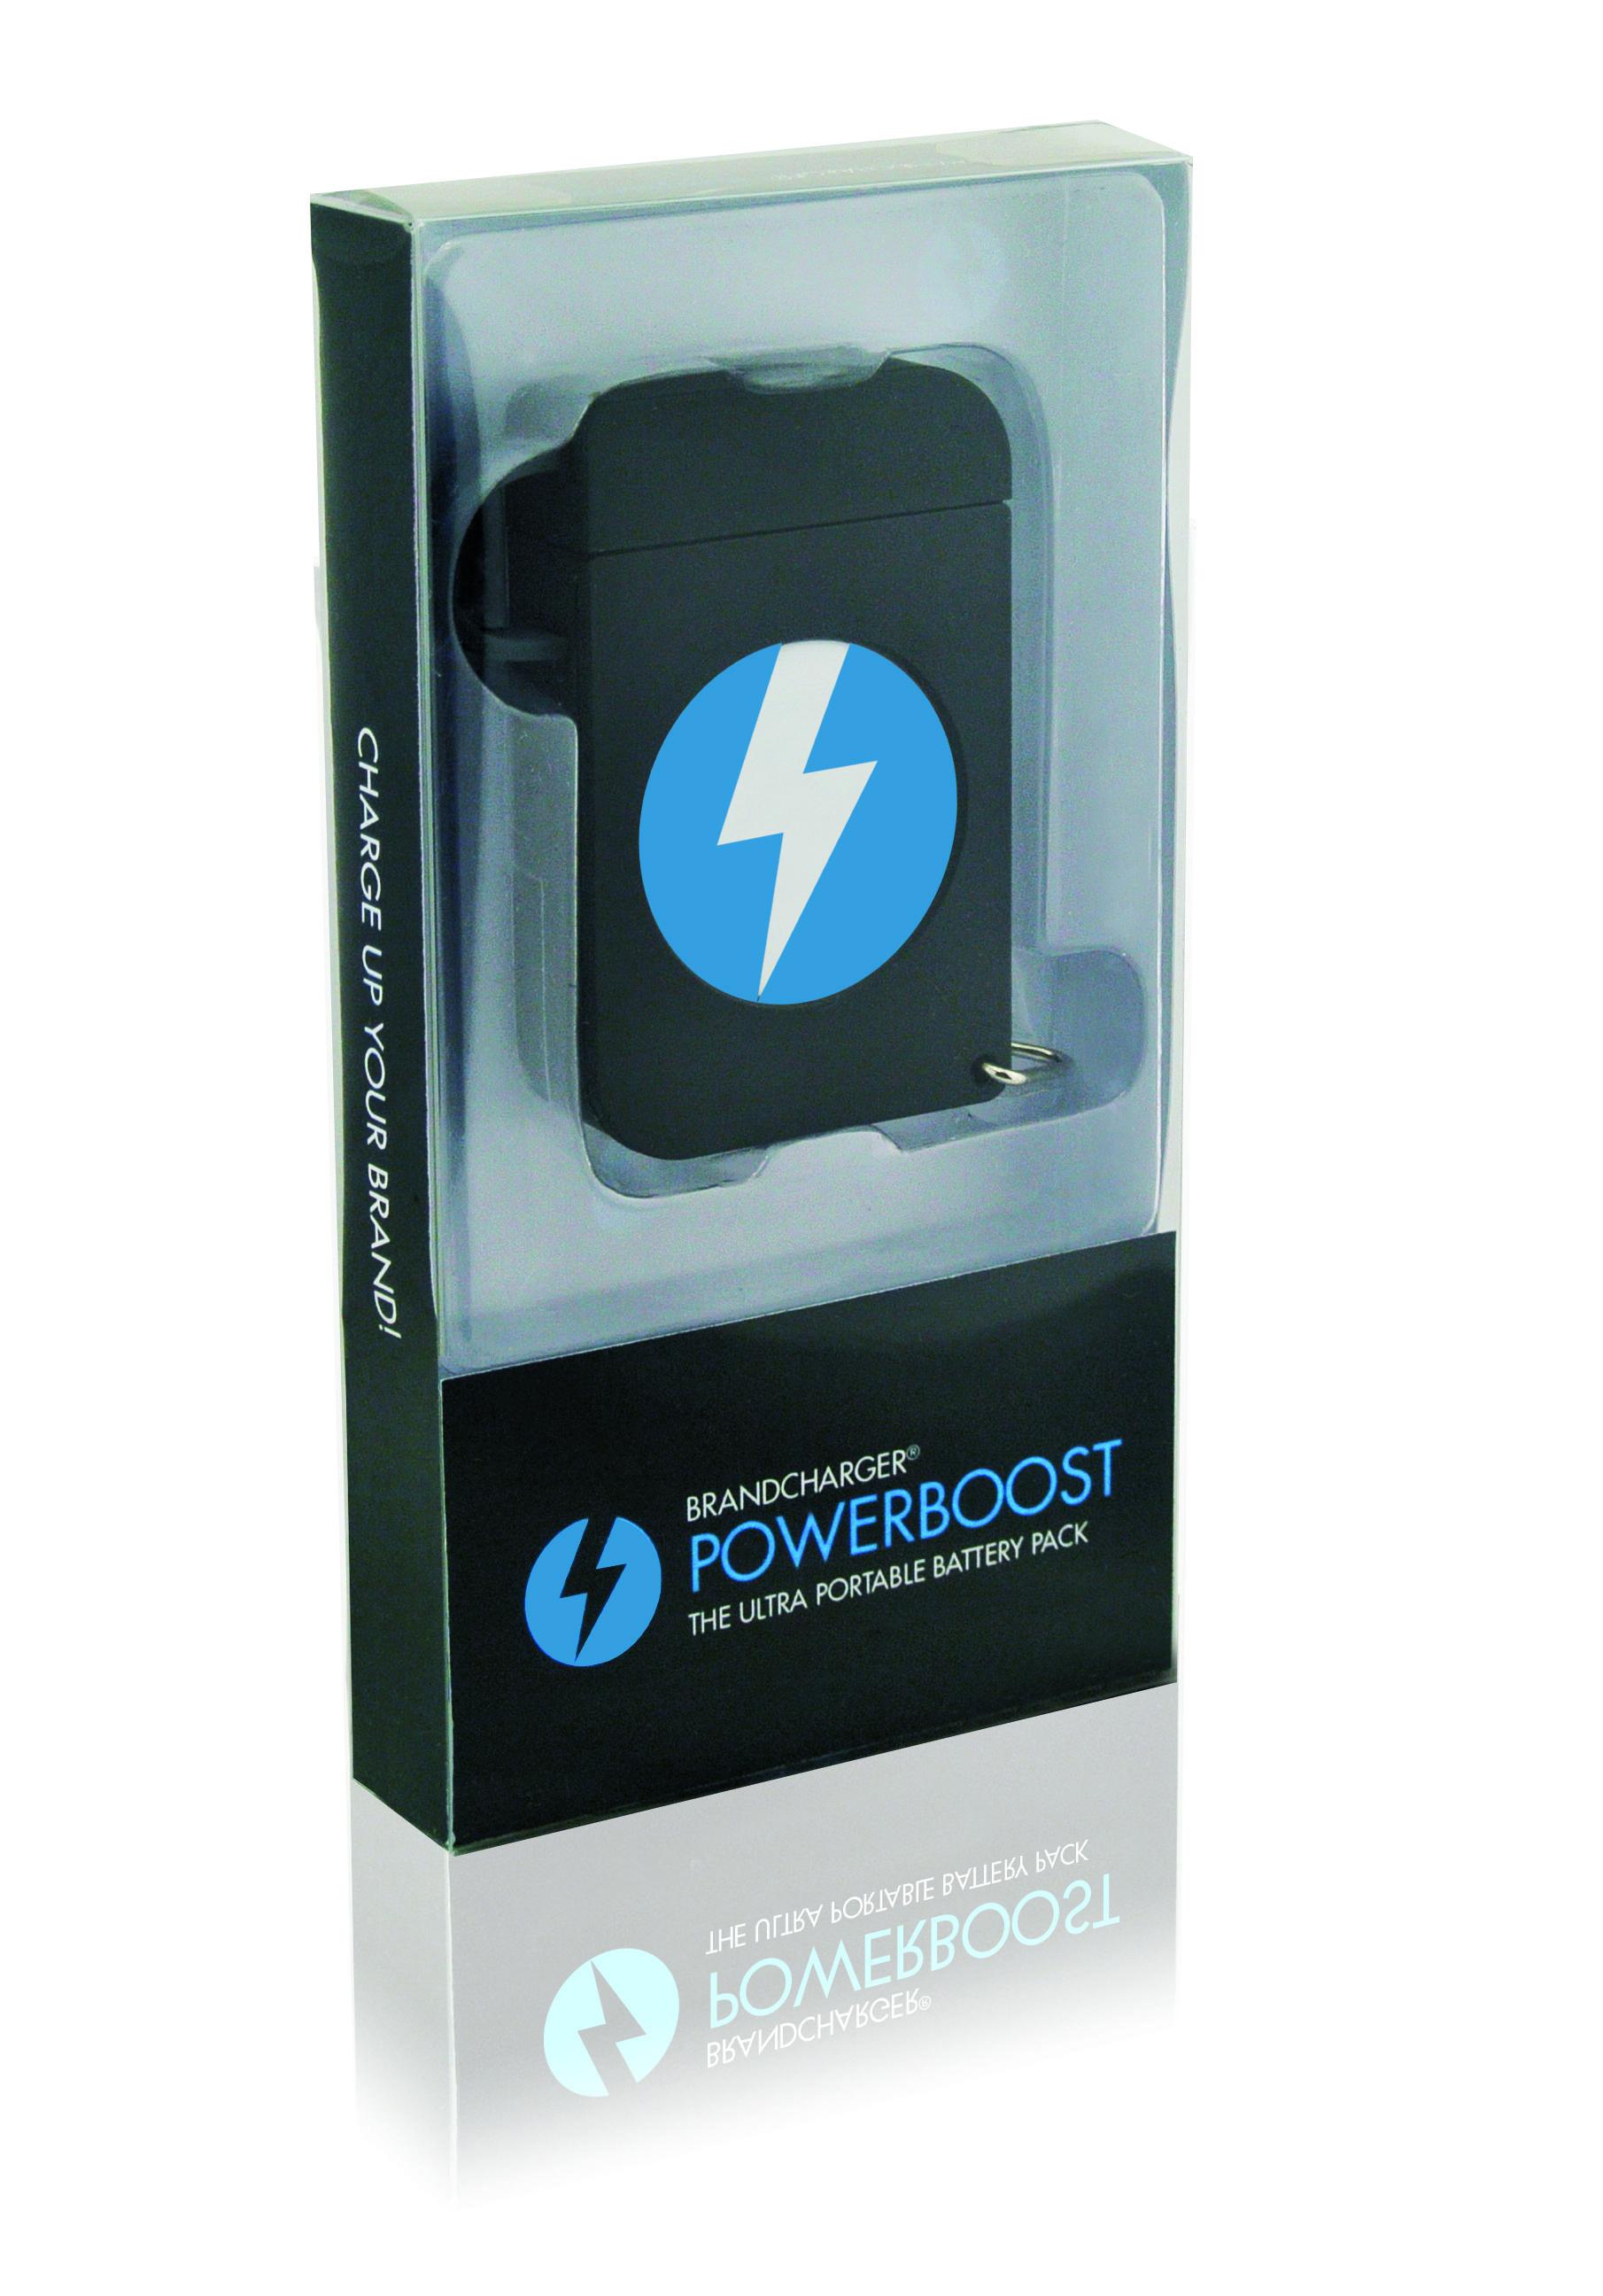 BC PowerBoost Blister Powerbank, Phone charging, Branded